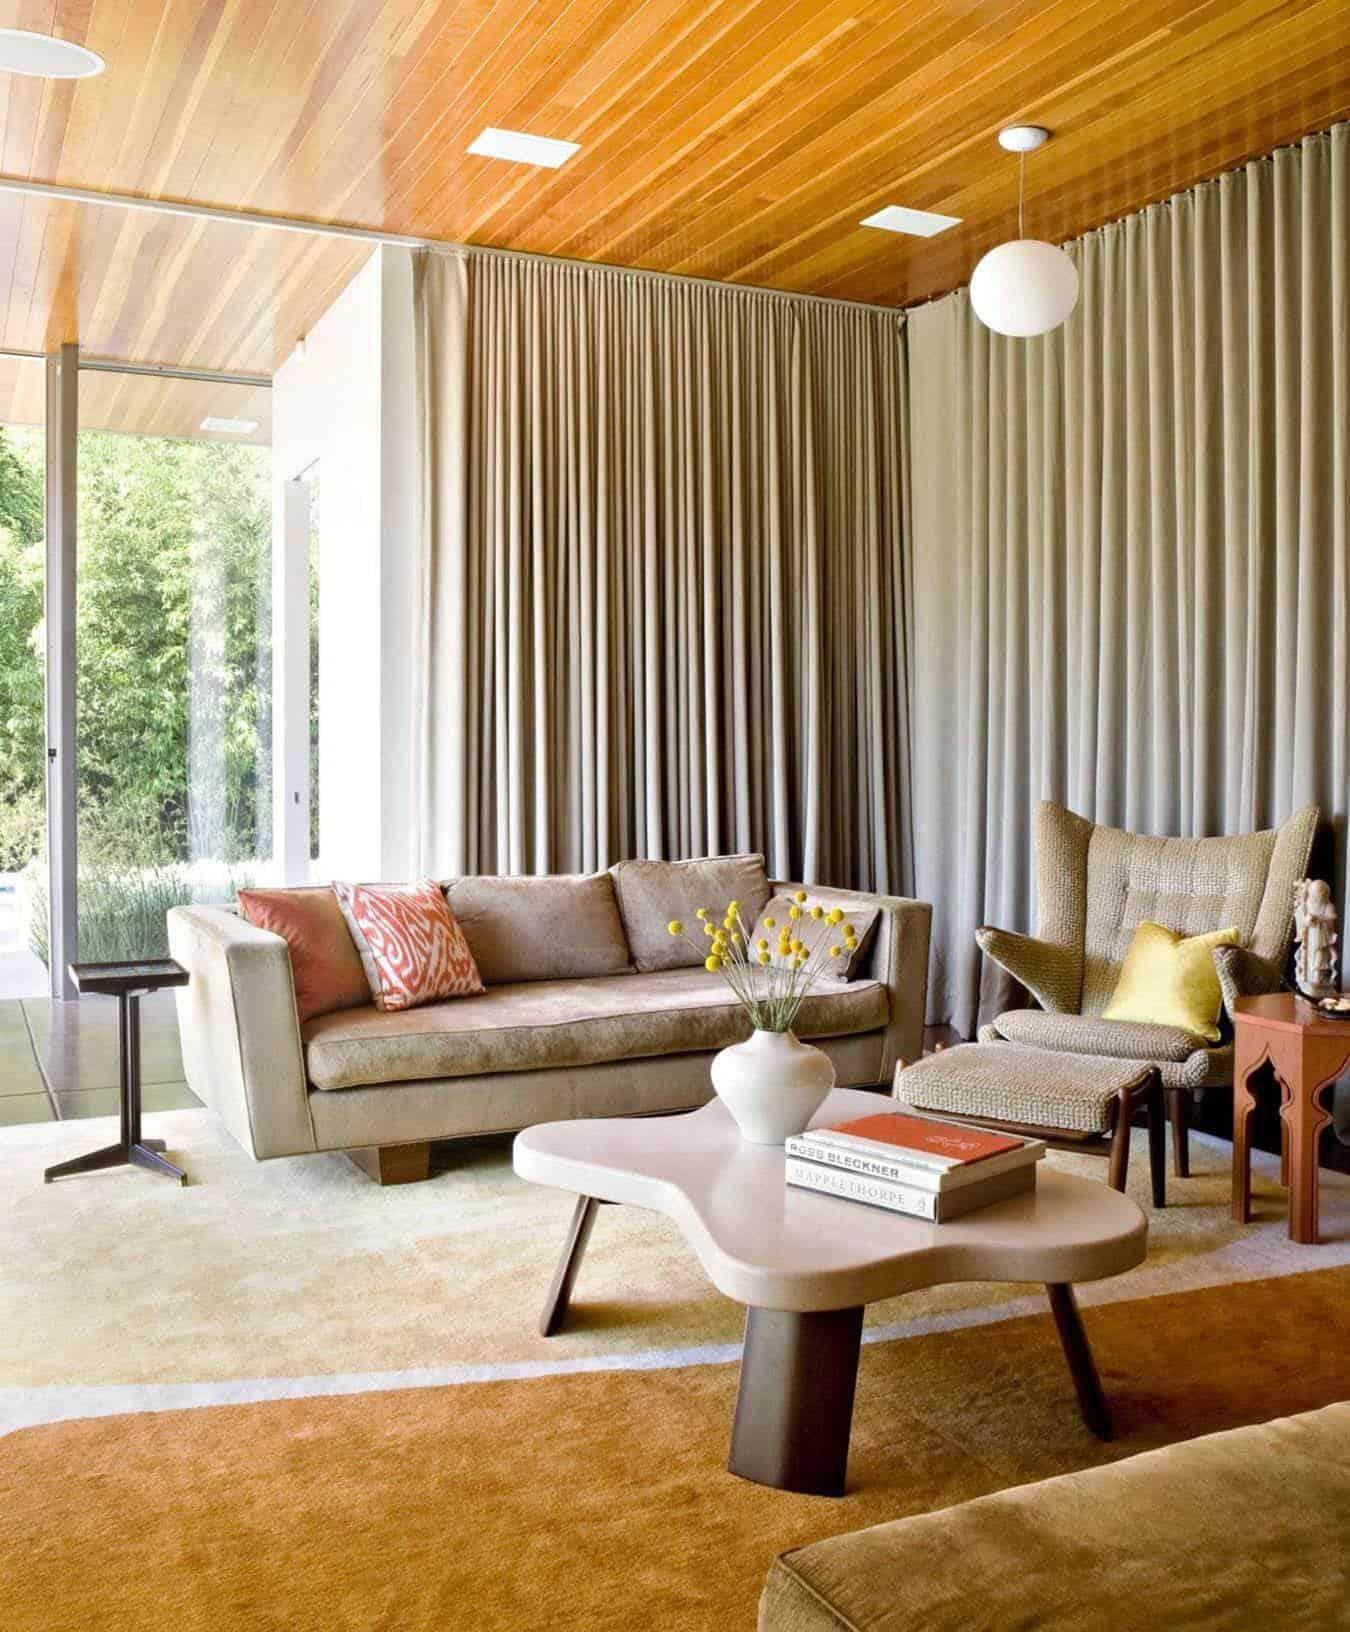 Maison Moderne Mid-Century-Jamie Bush-06-1 Kindesign